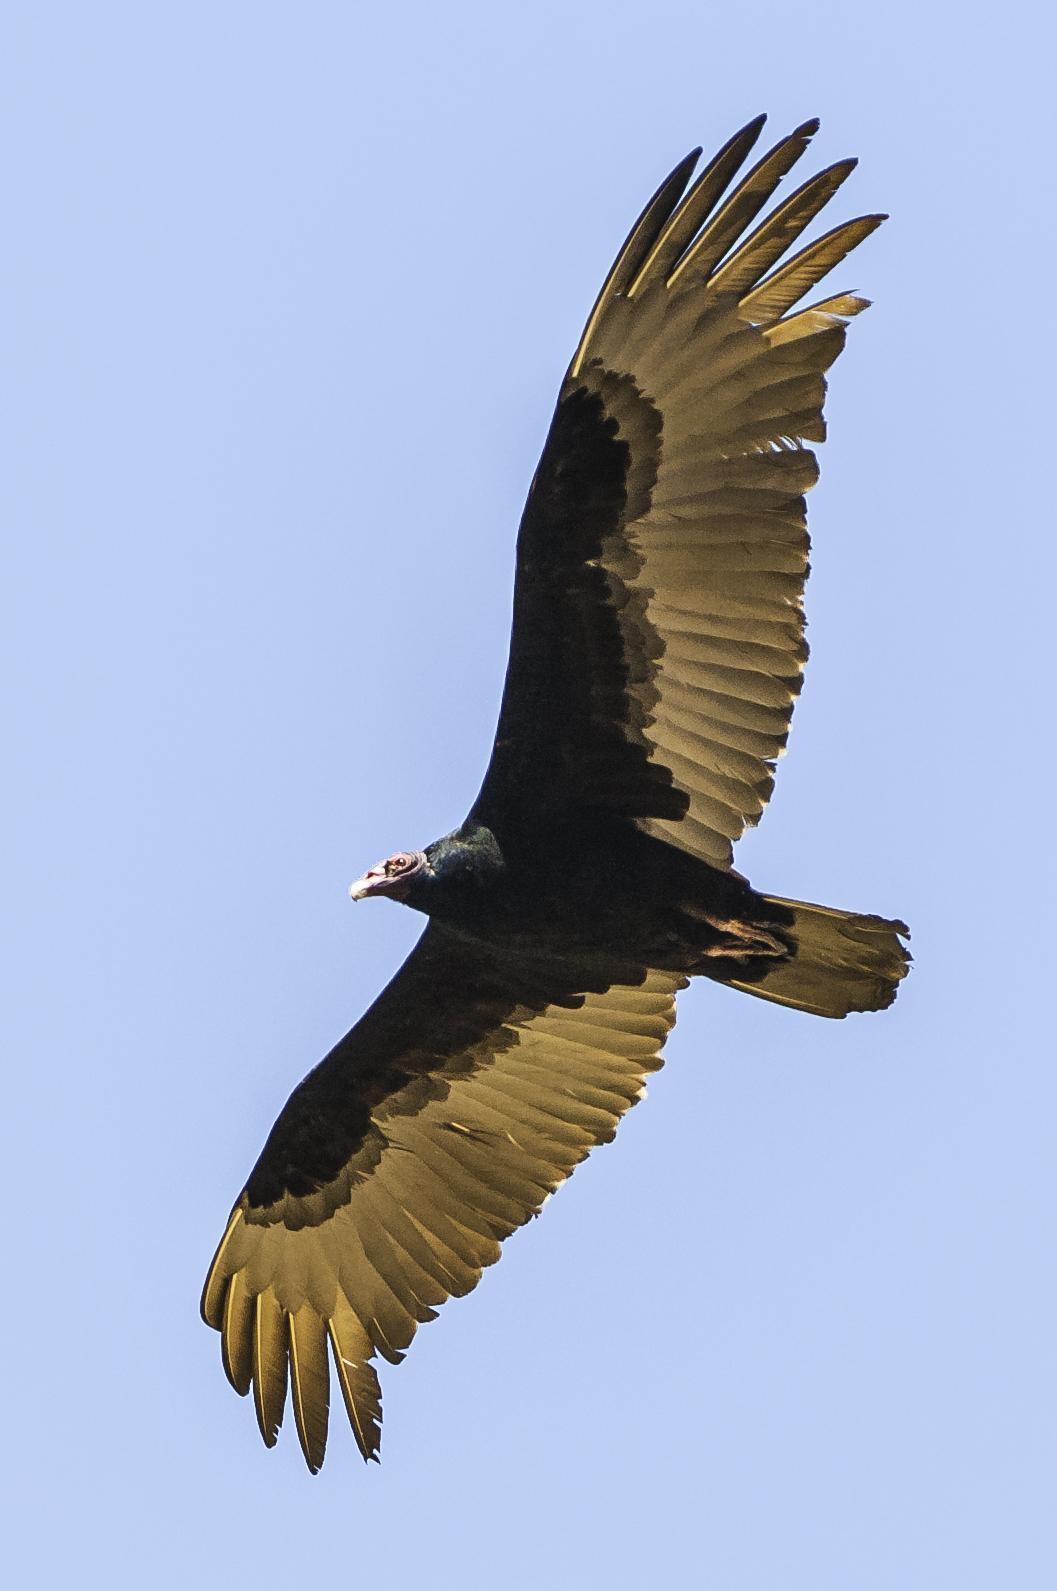 Turkey Vulture Photo by Mason Rose